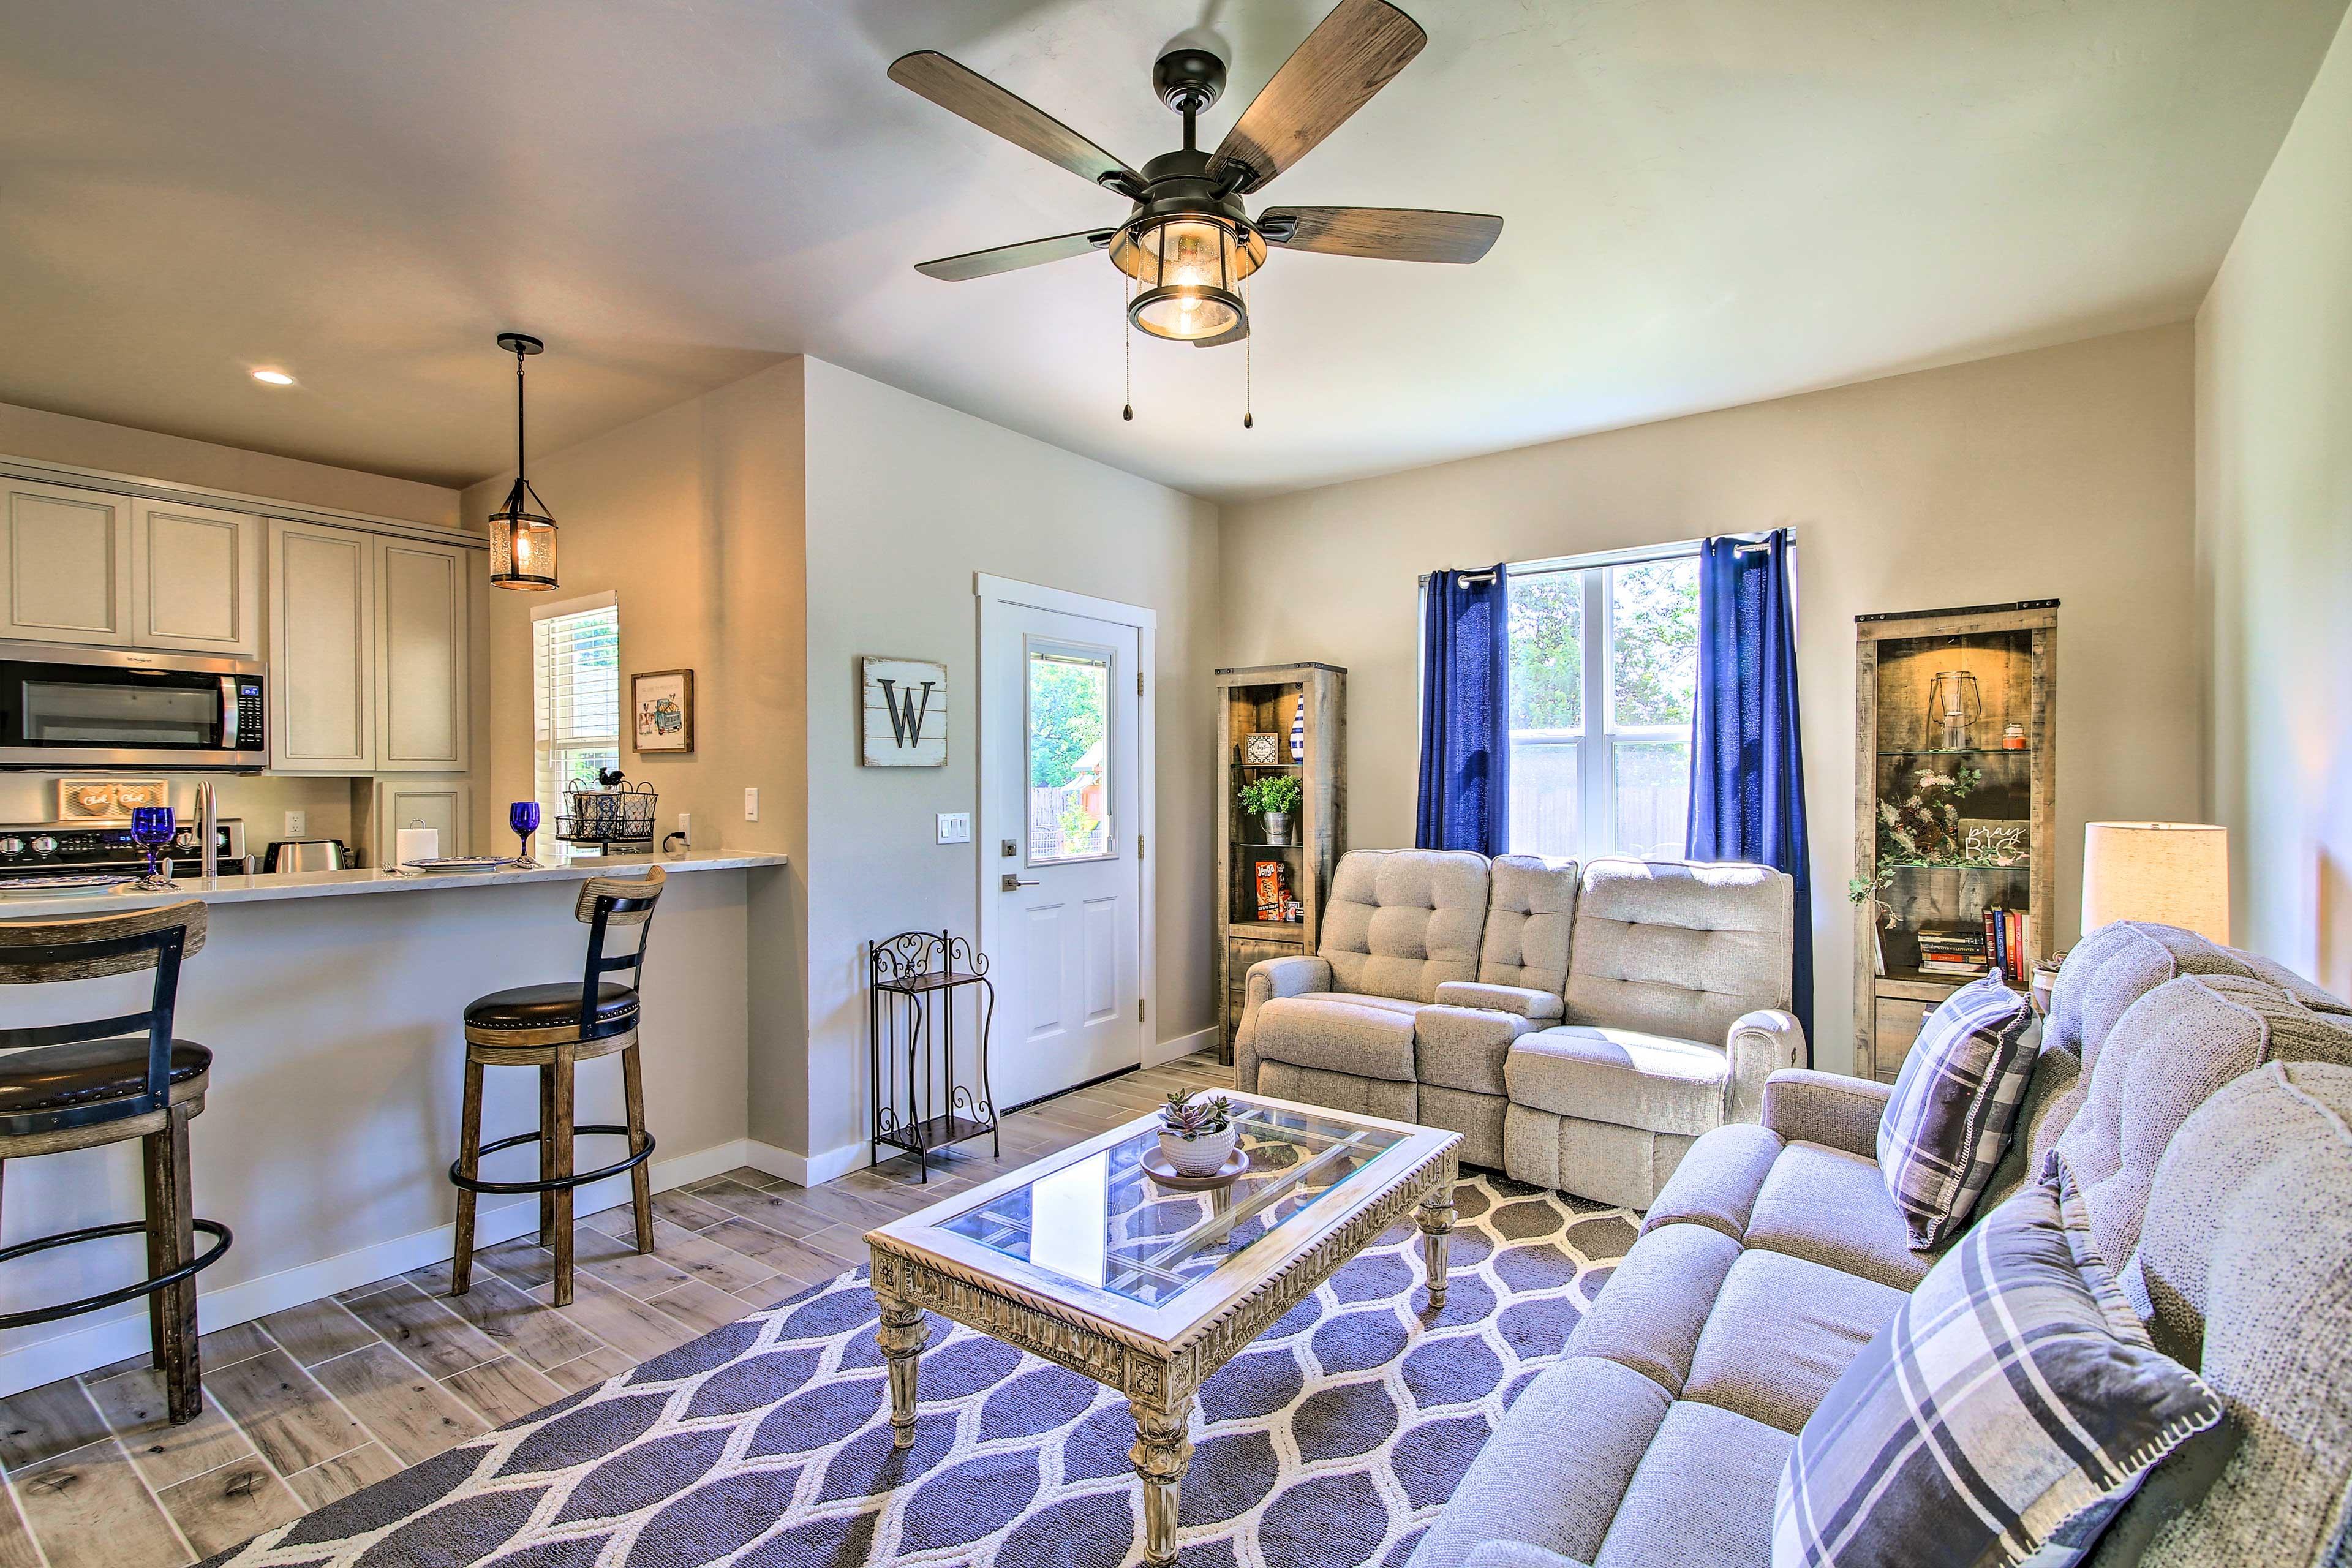 This cozy retreat offers a private escape in Fredericksburg!